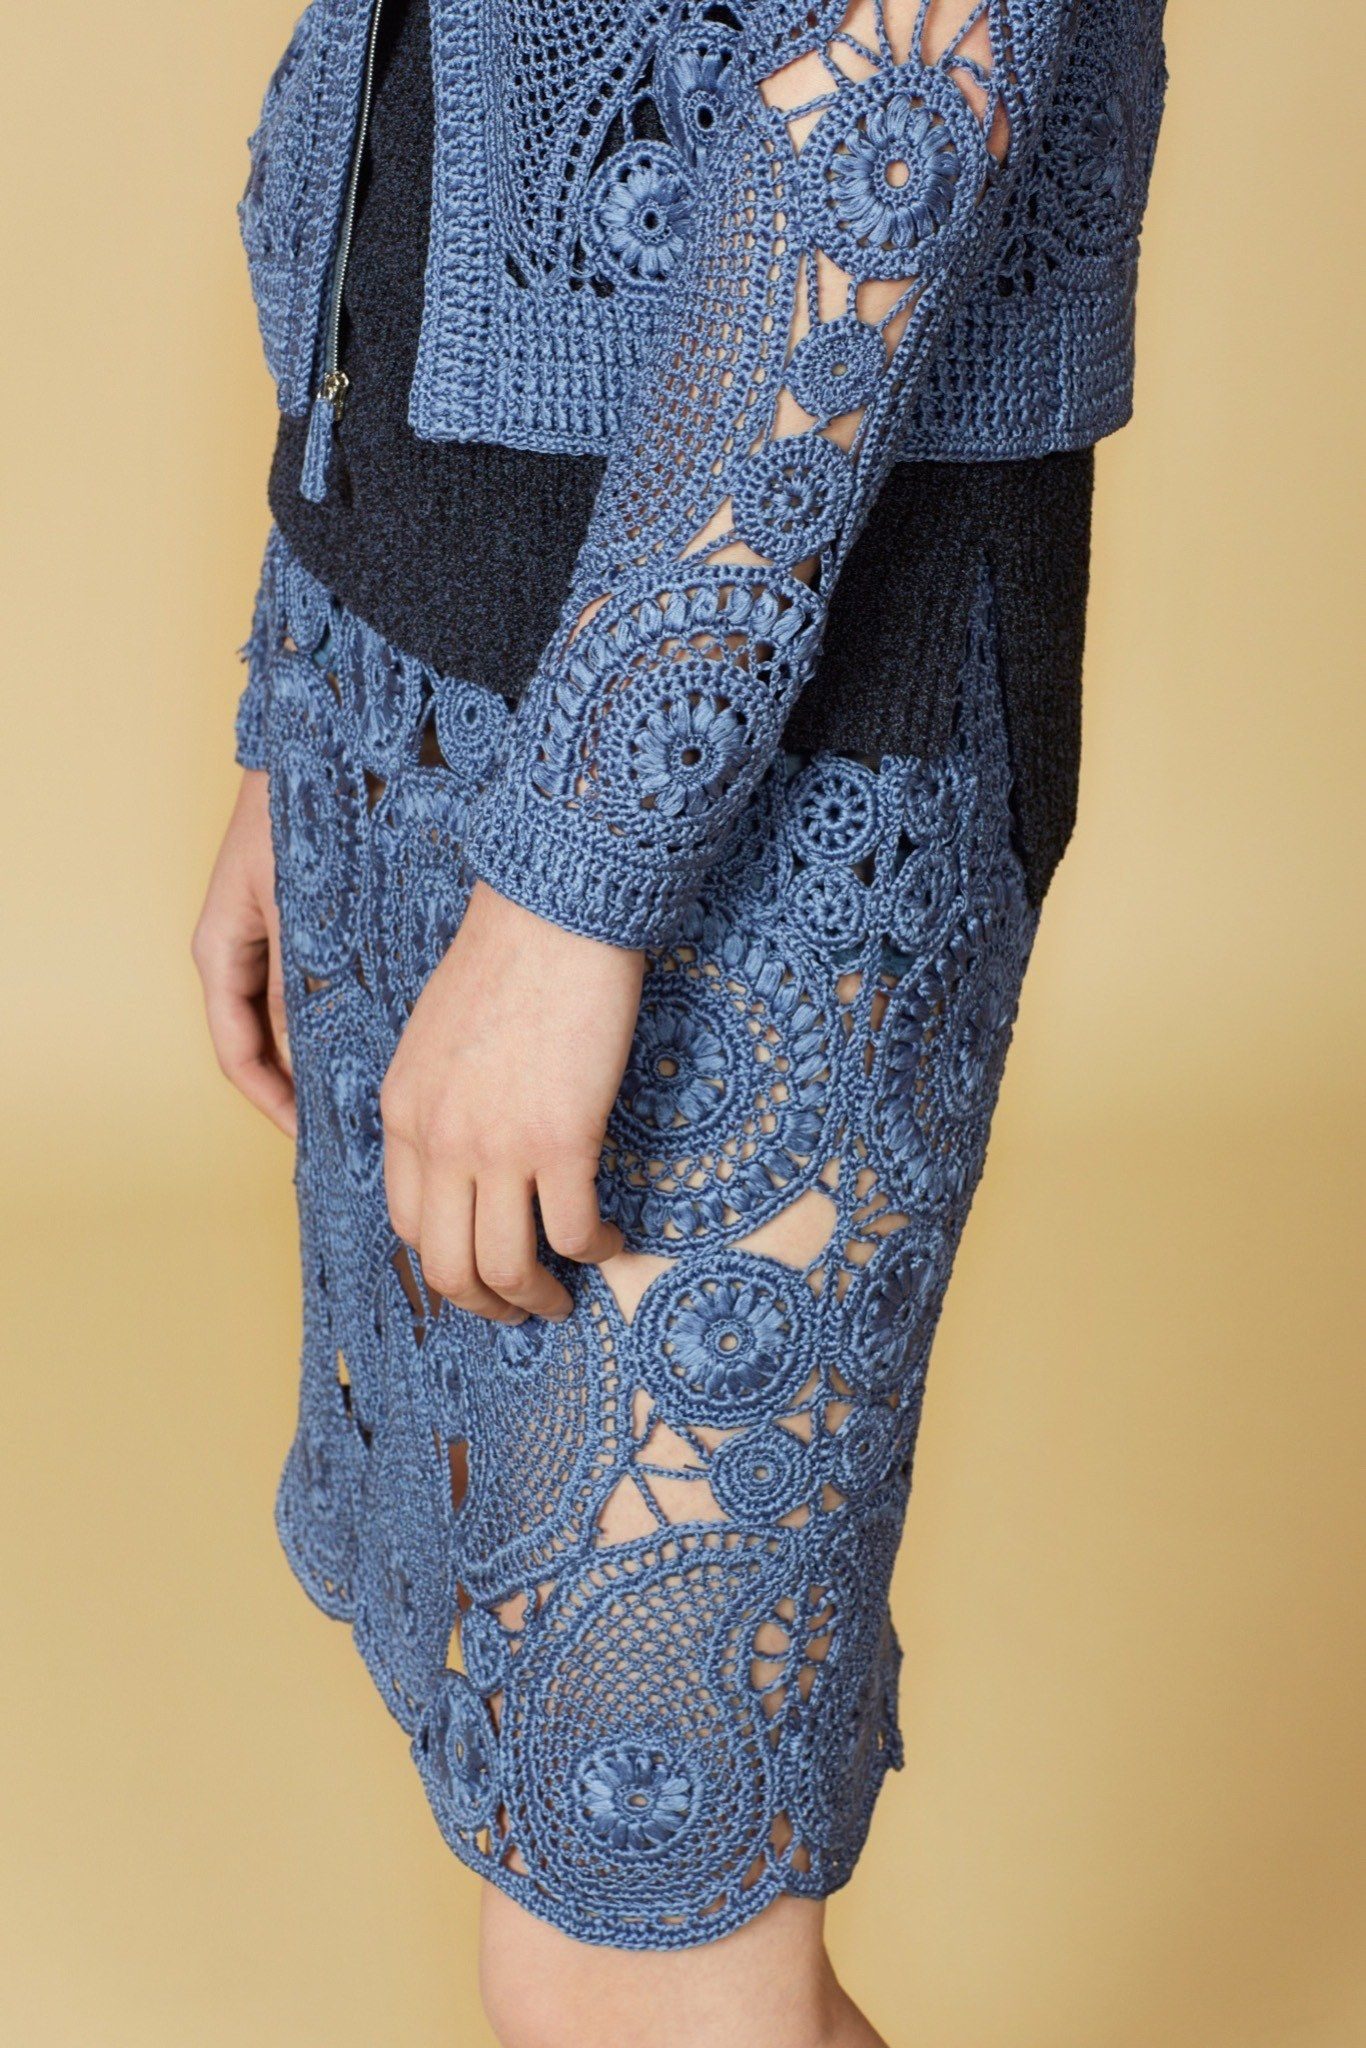 Orley Resort 2016 Fashion Show Moda Saia De Croche Roupas De Croche